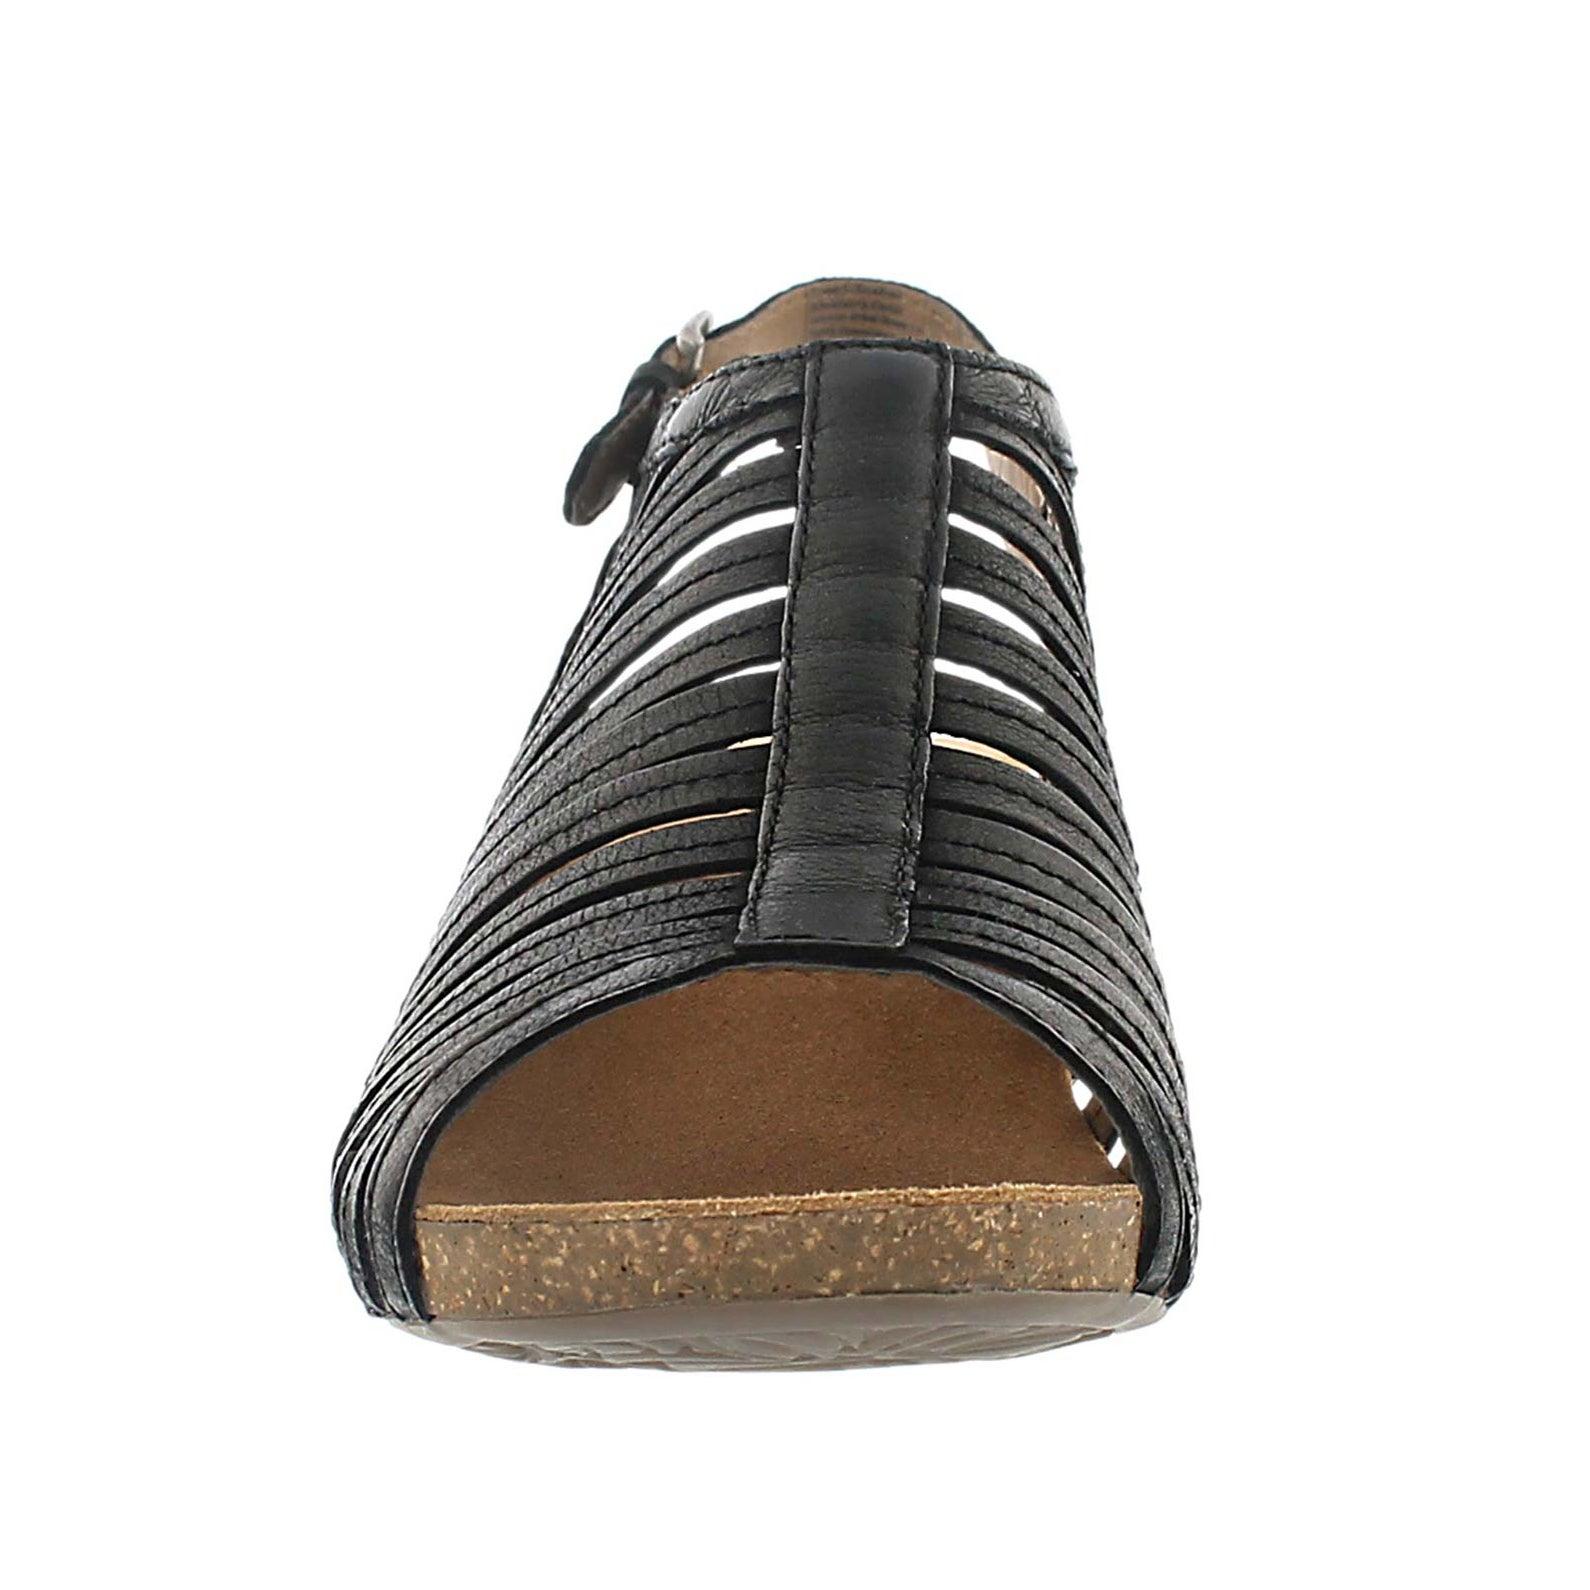 Lds Ruth 21 black cut out dress sandal